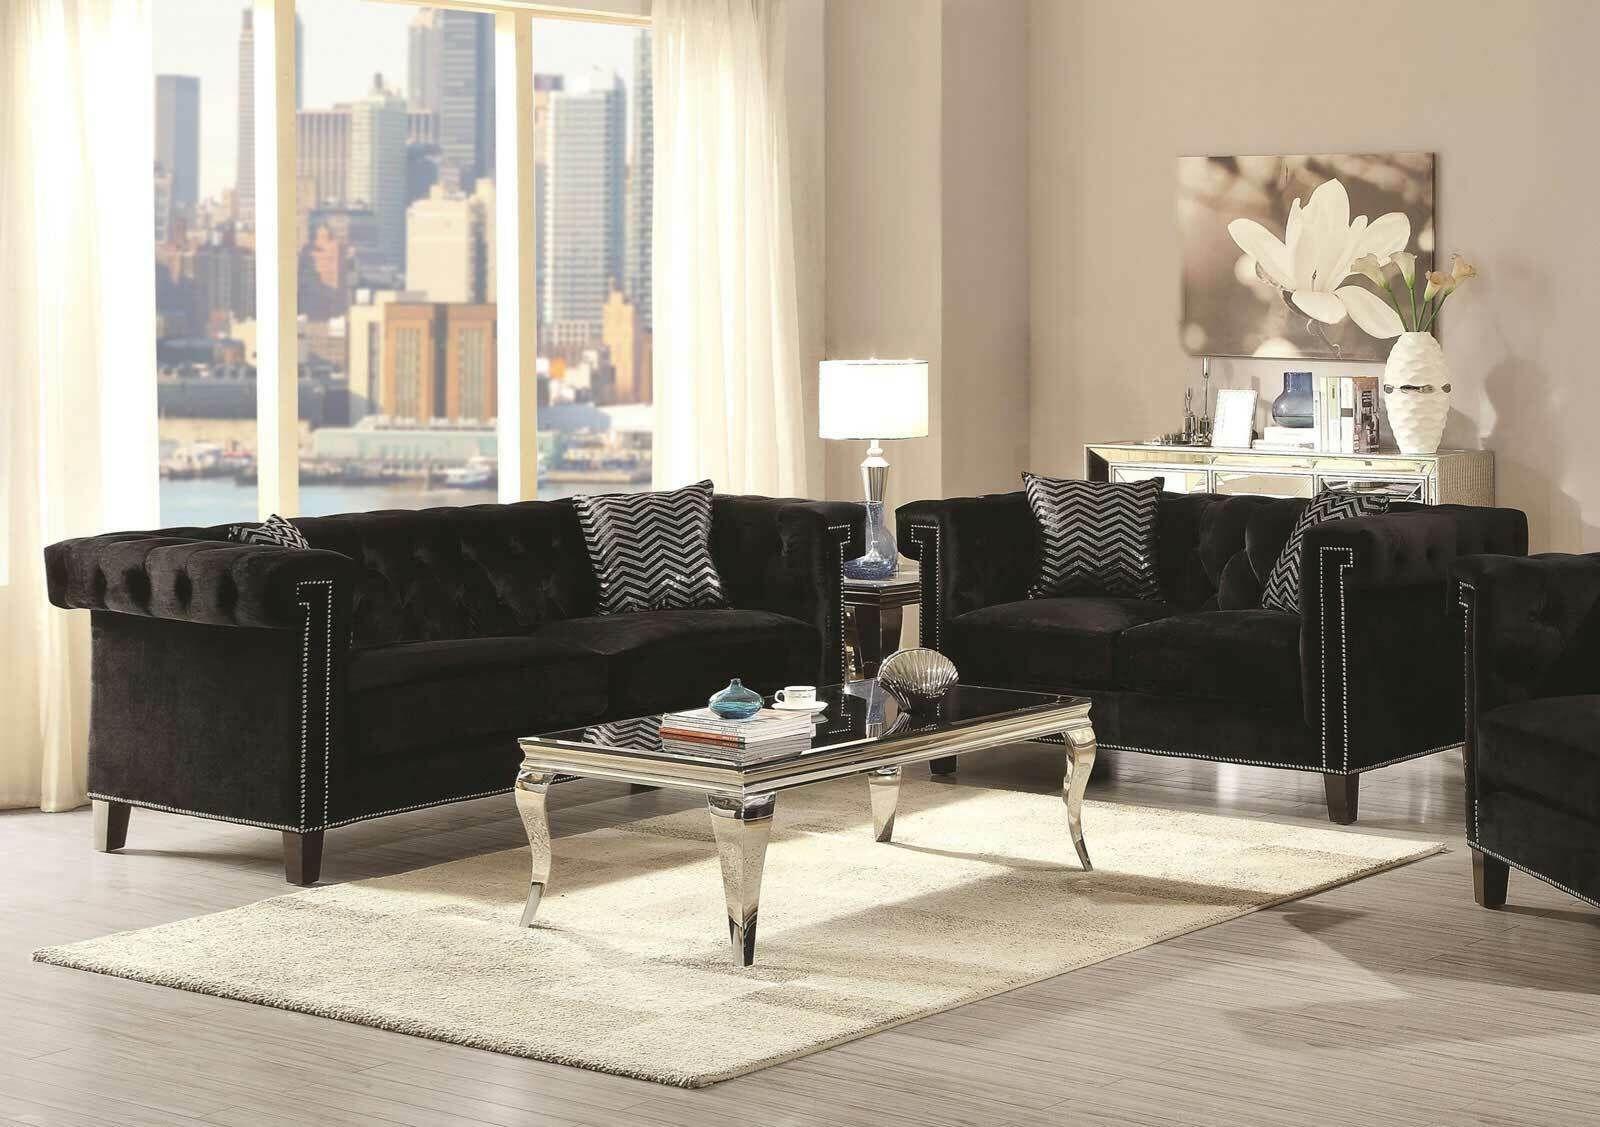 New Mid Century Modern Black Fabric Sofa Loveseat Living Room Furniture Set Ig7c Microfiber Couch Ideas Of M Living Room Sets Furniture Loveseat Living Room